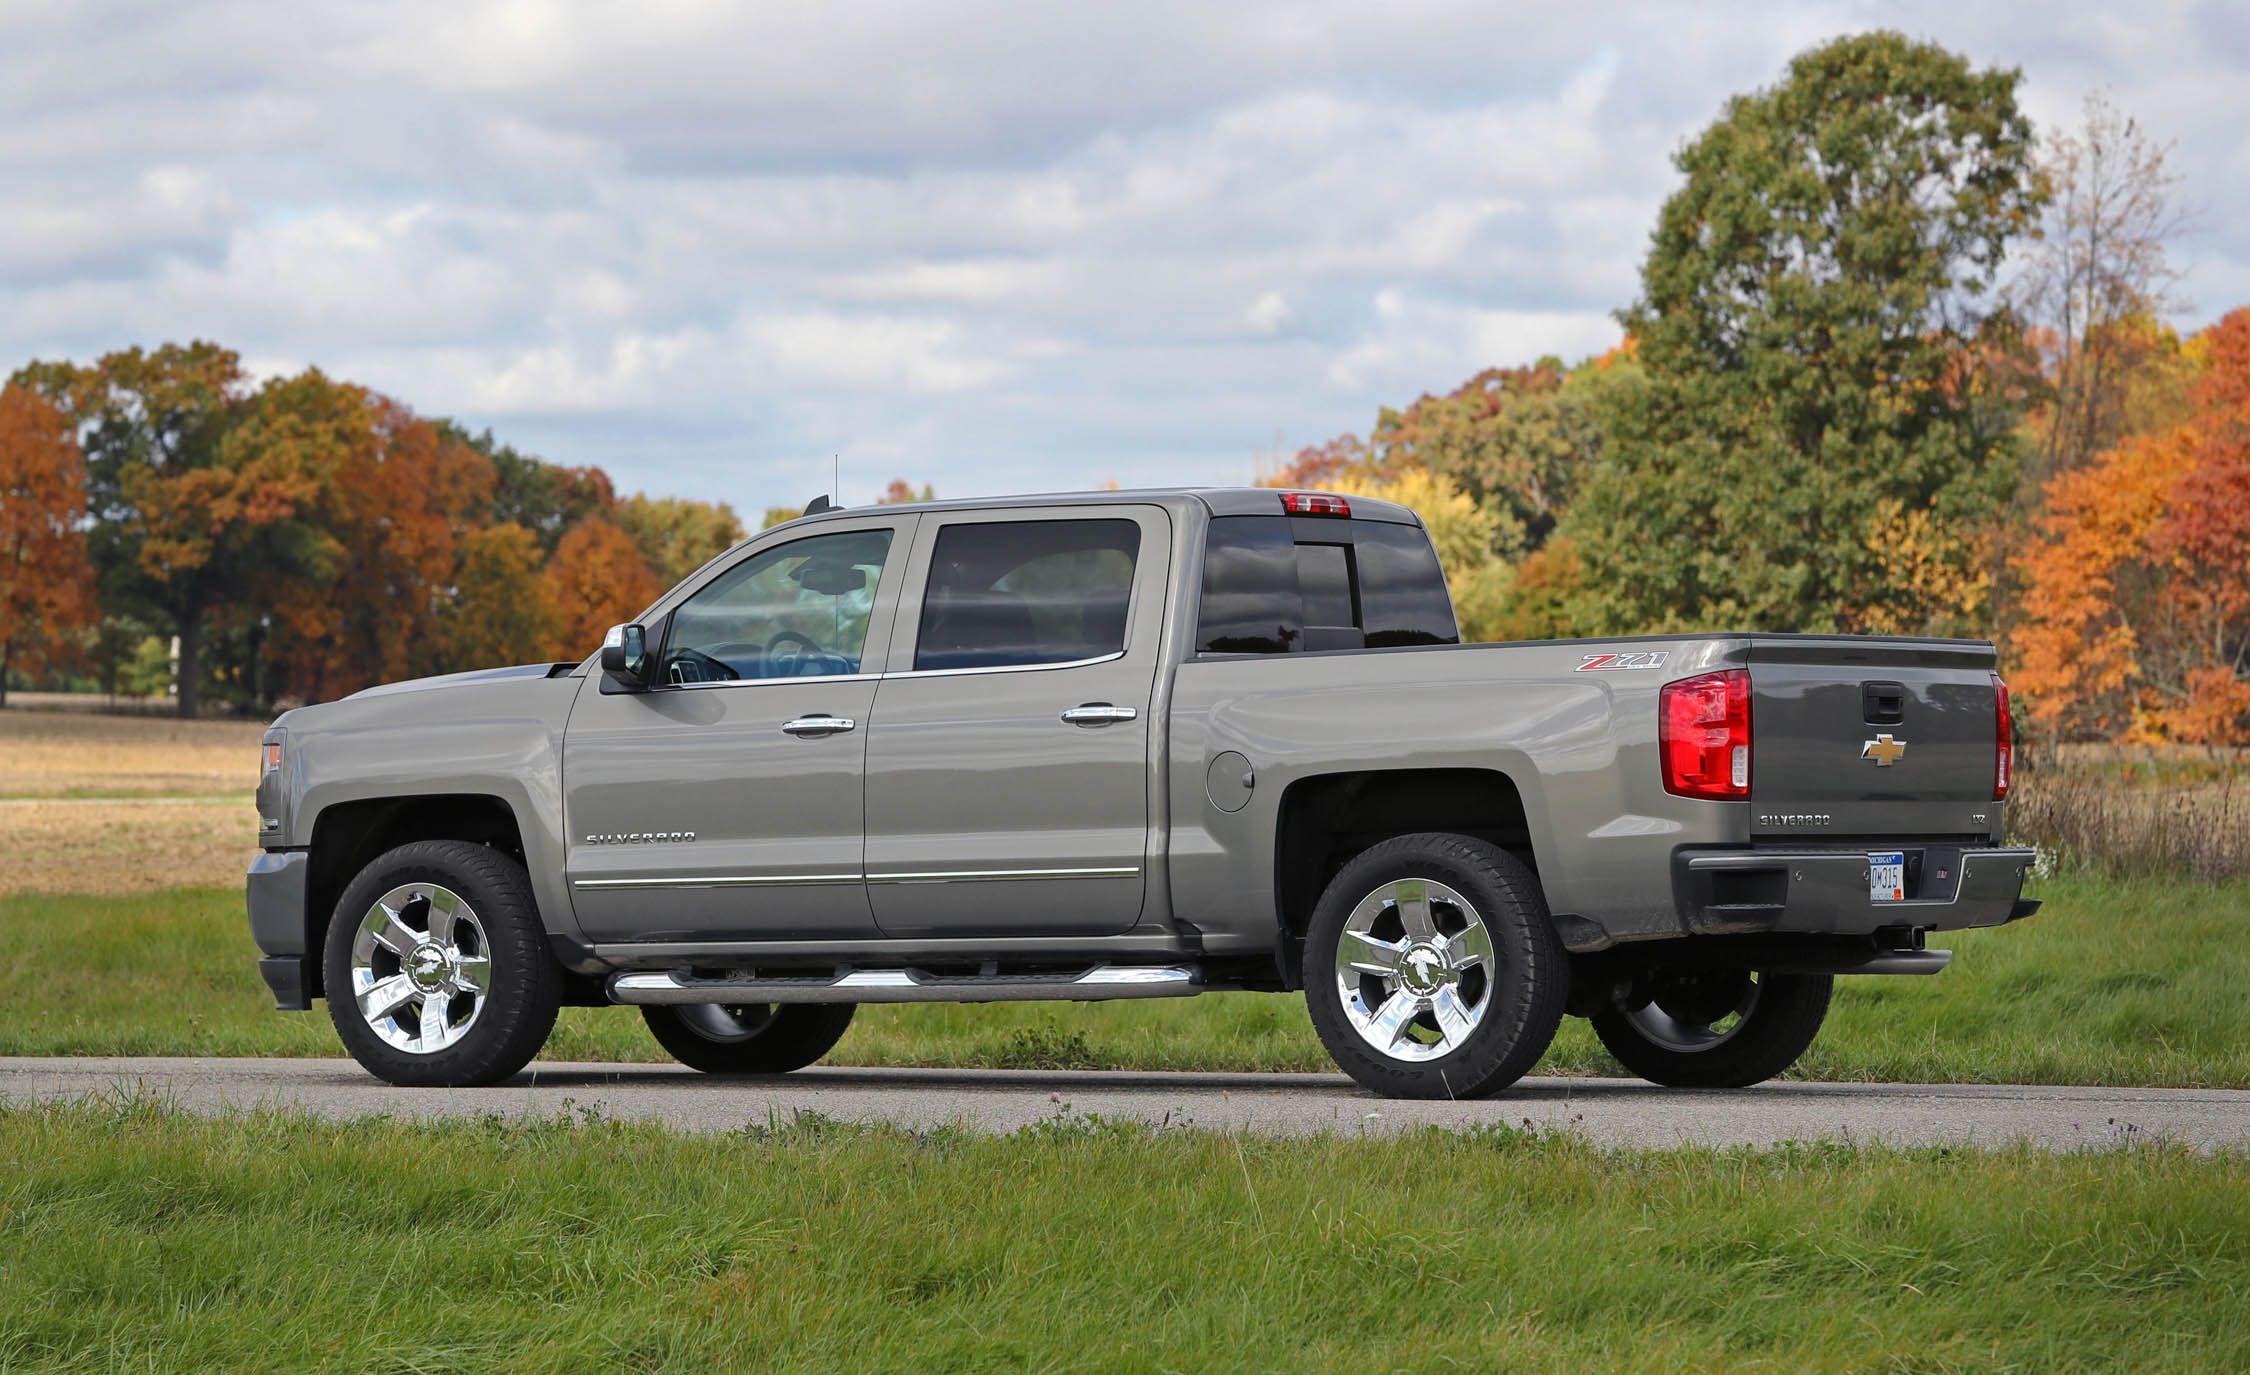 Nissan Infiniti Lt >> 2018 Chevrolet Silverado 1500 | Fuel Economy Review | Car and Driver